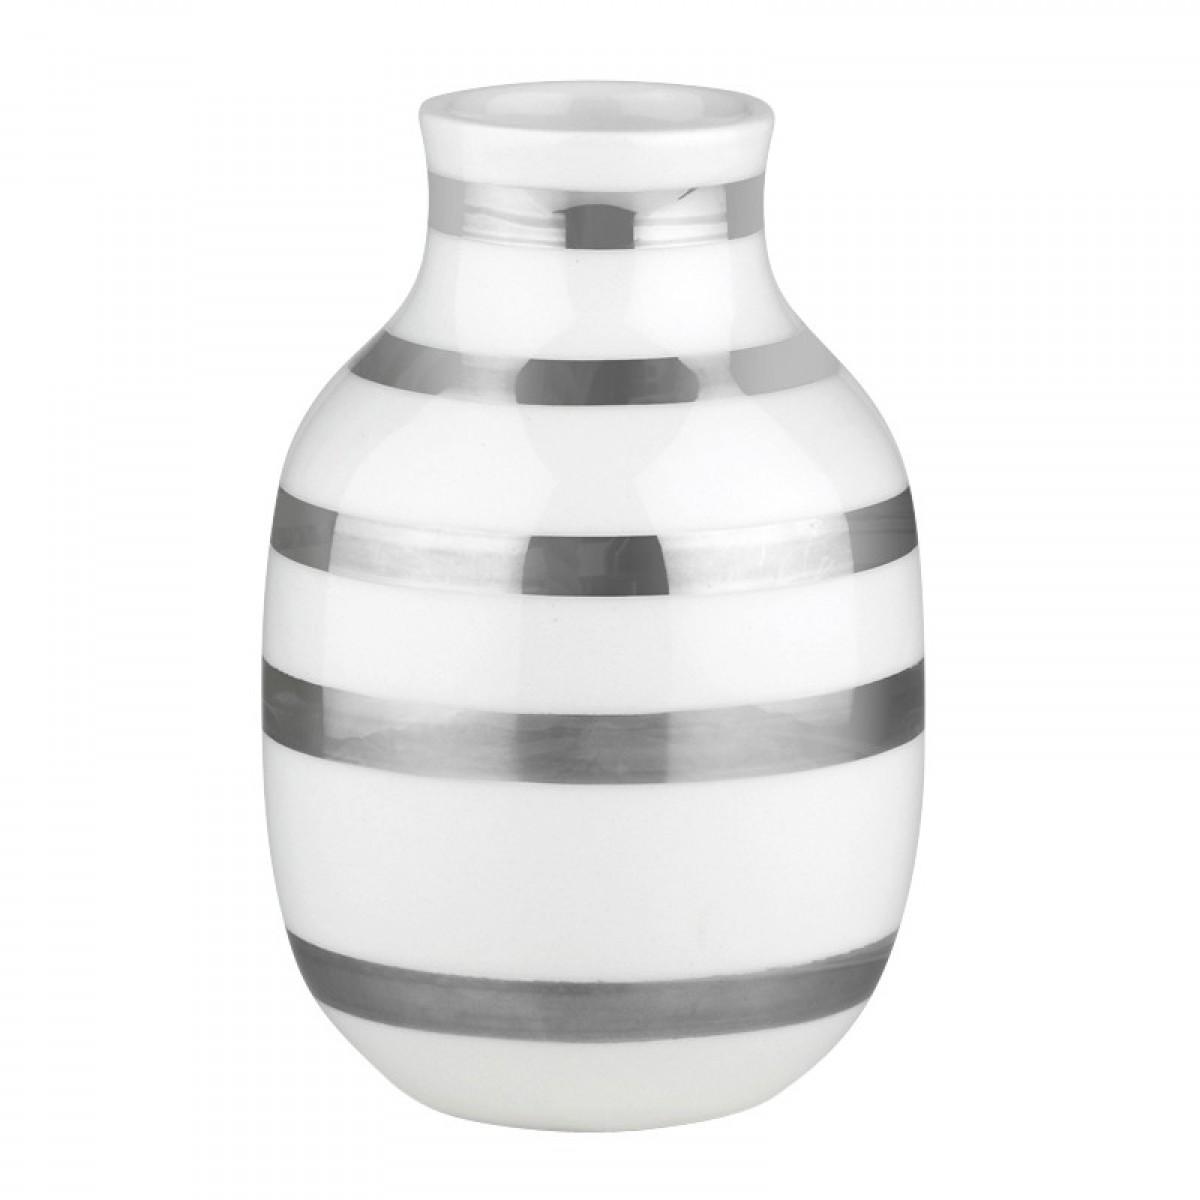 KÄHLER Omaggio vase sølv 12,5 cm.